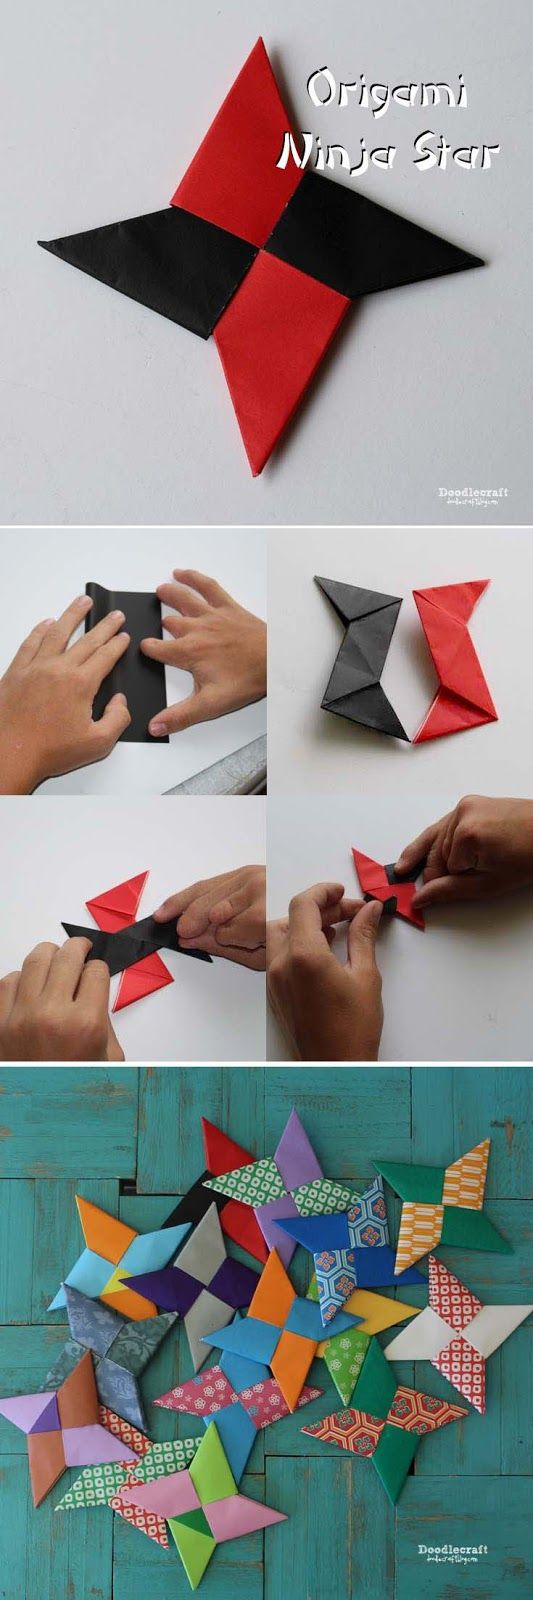 Doodlecraft: Origami Ninja Stars!                                                                                                                                                     More                                                                                                                                                                                 Más